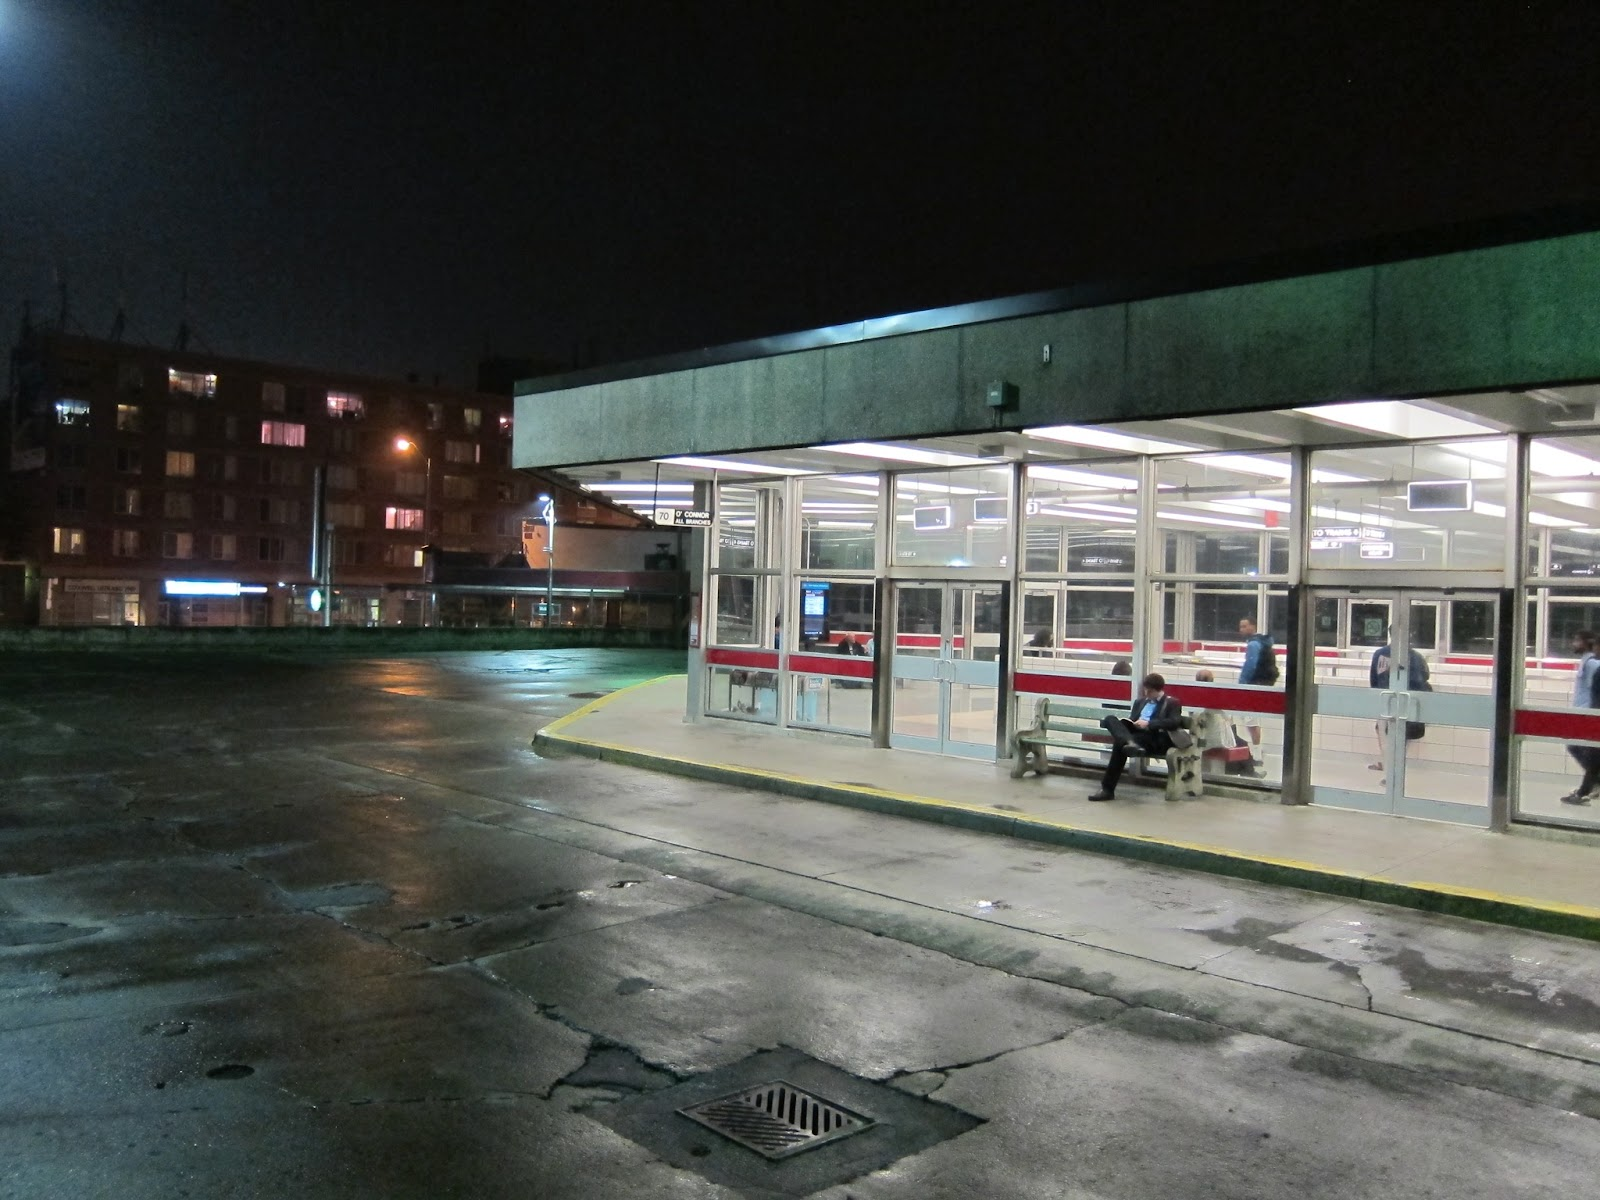 Coxwell station bus platform